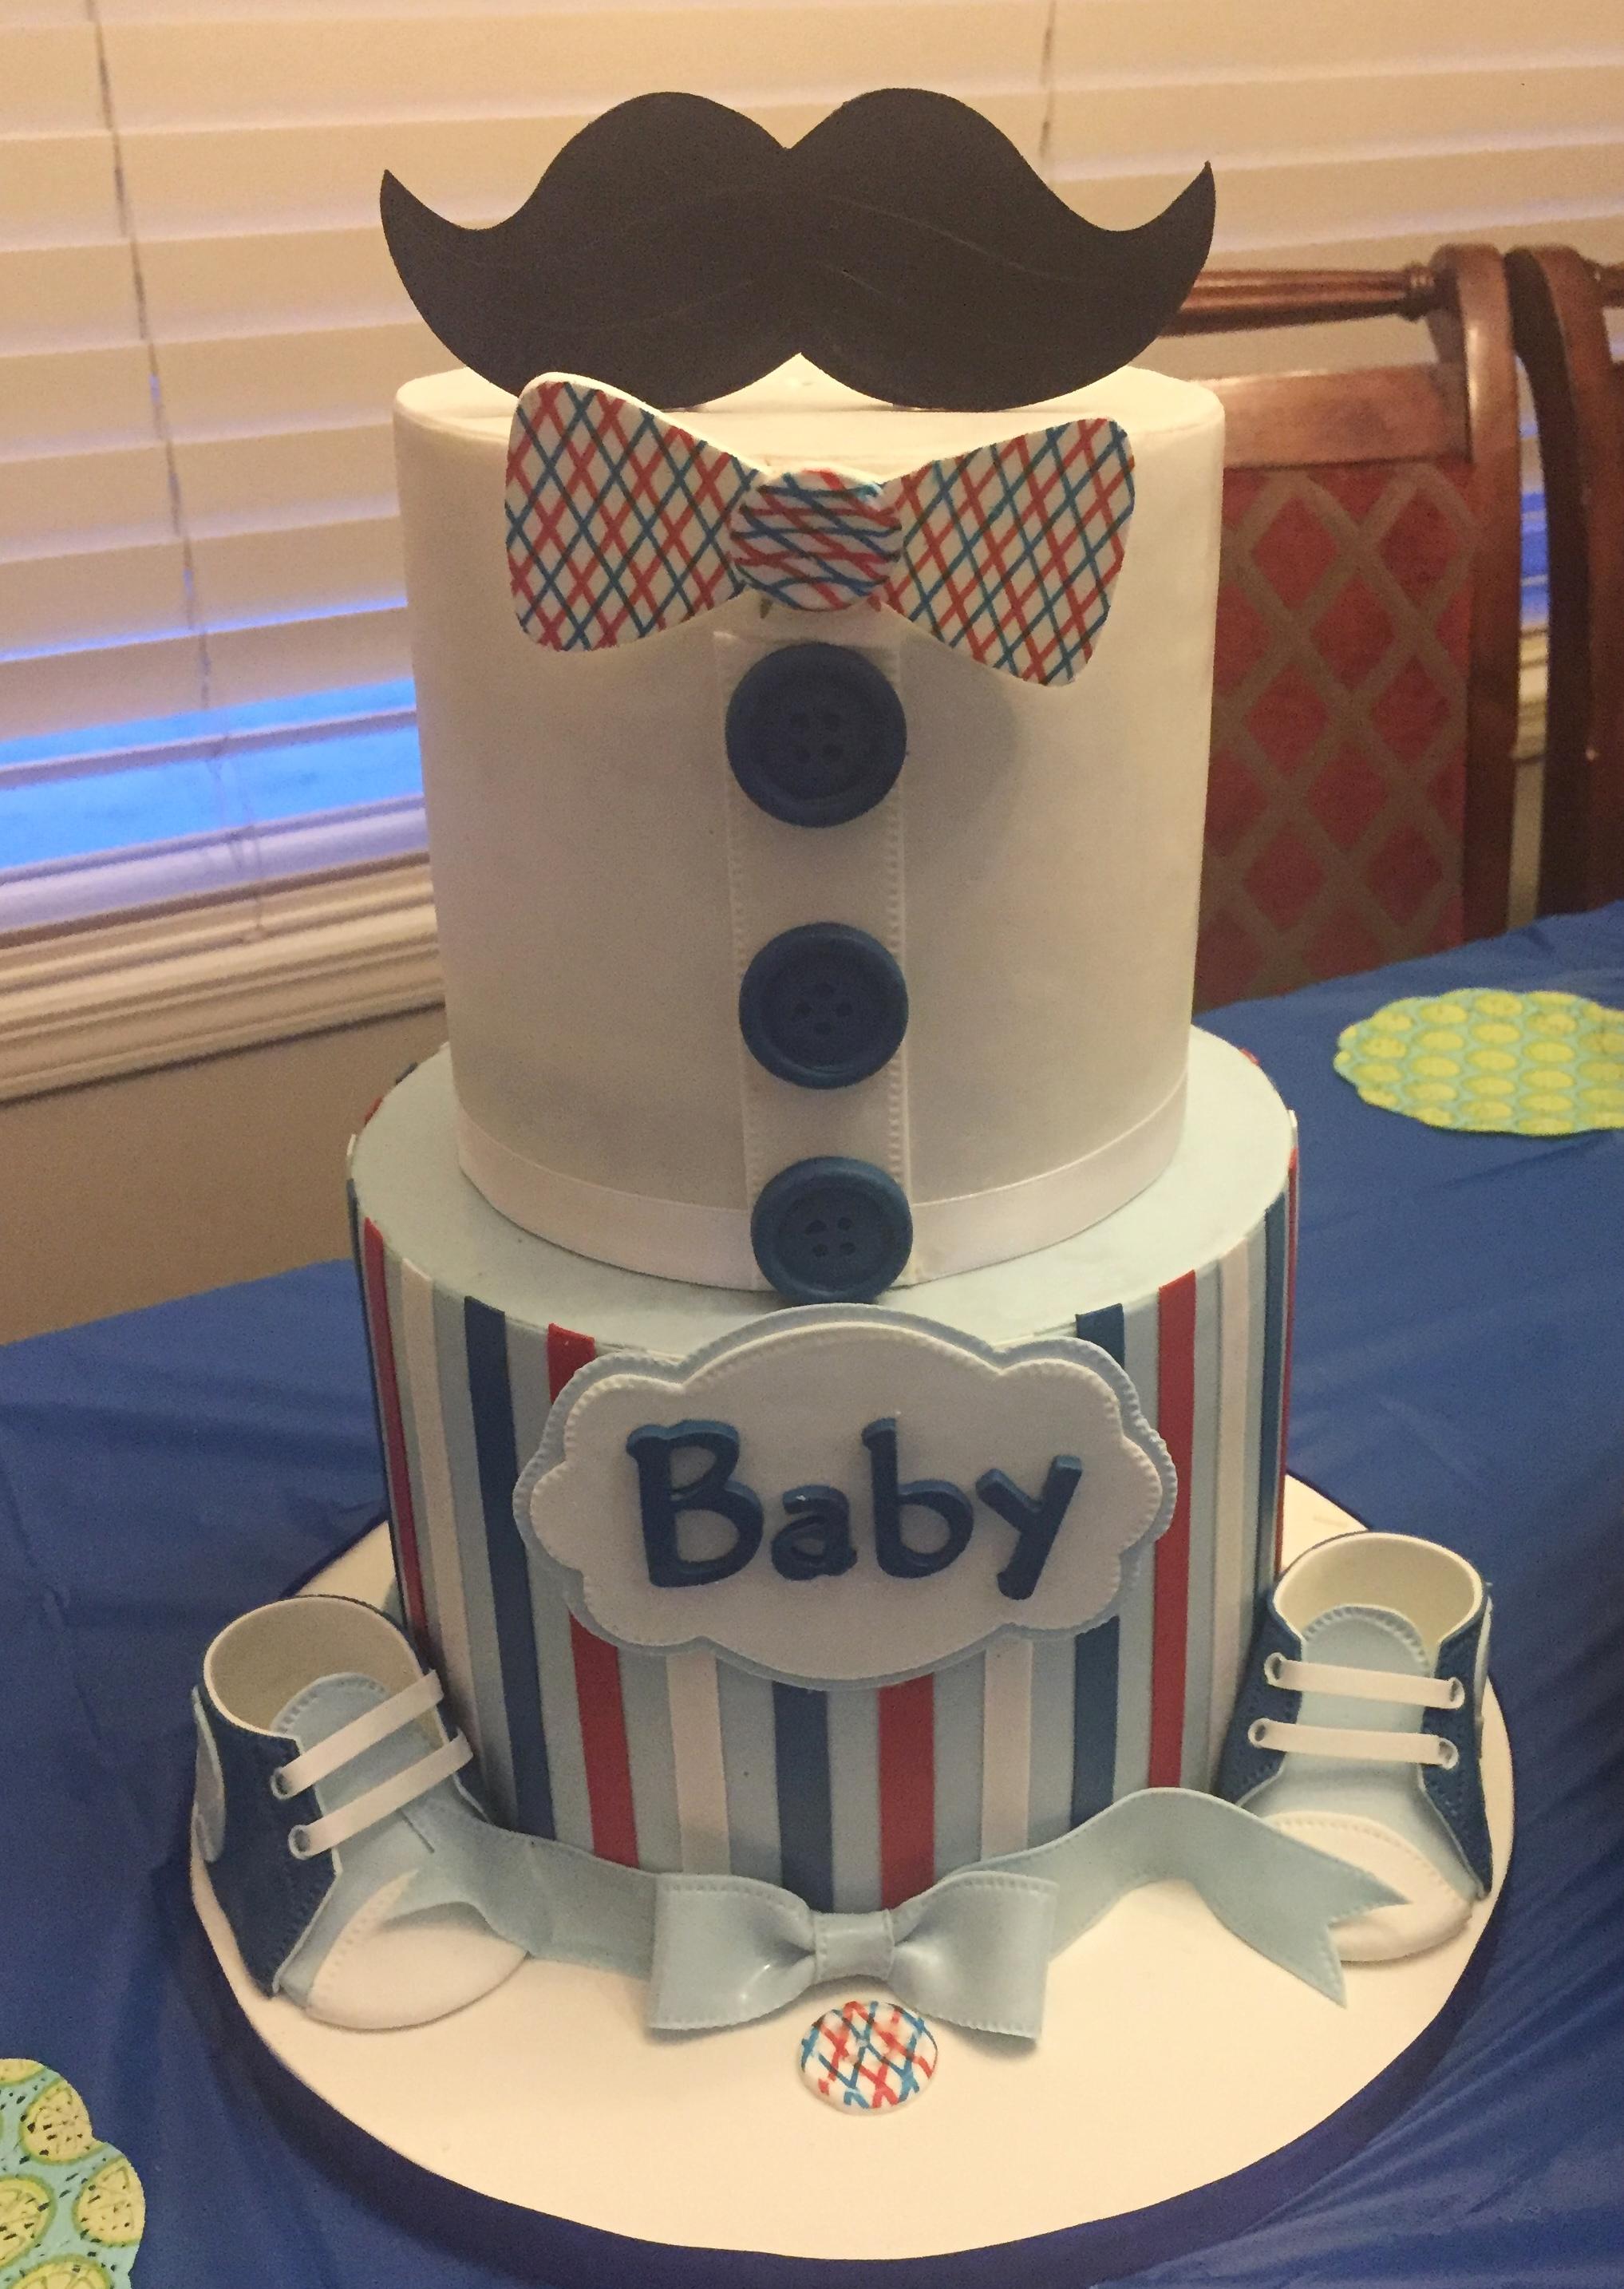 Baby Shower Cake by Terry  @GratedNutmeg